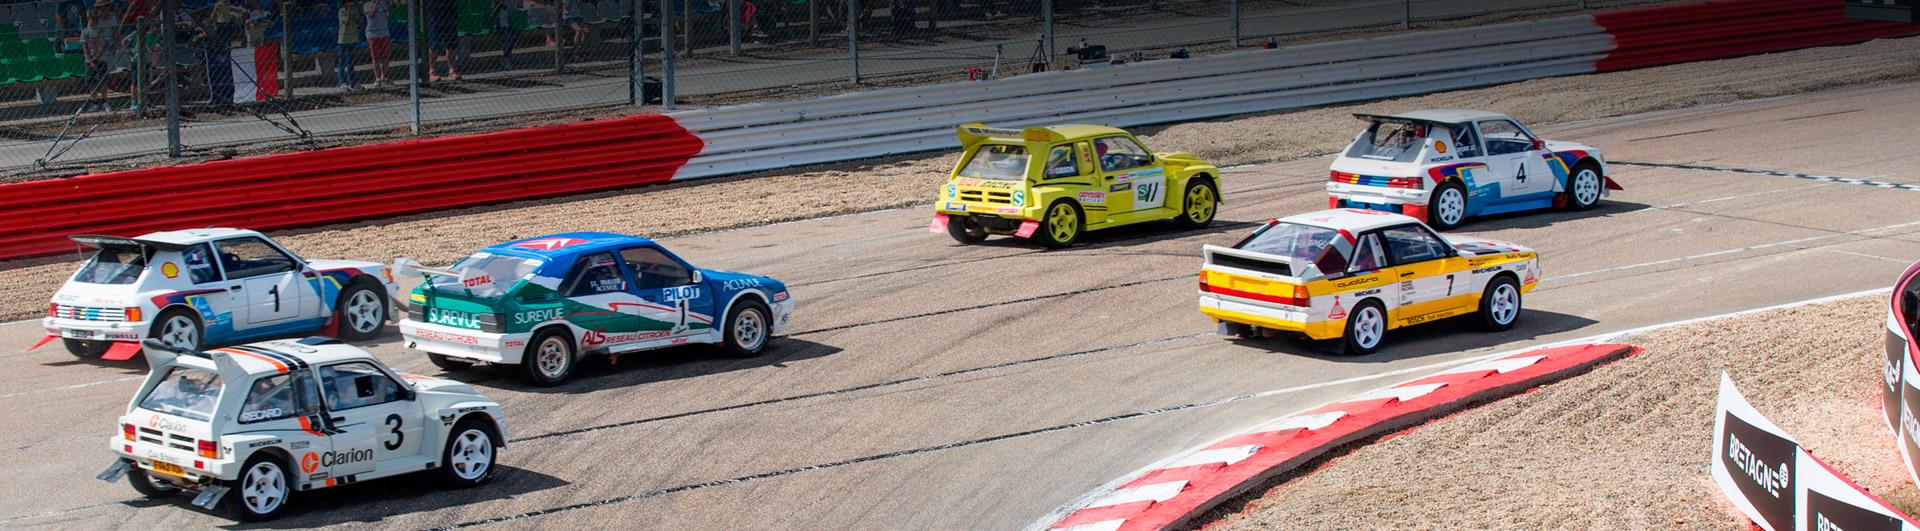 rallycross de lohéac legend car